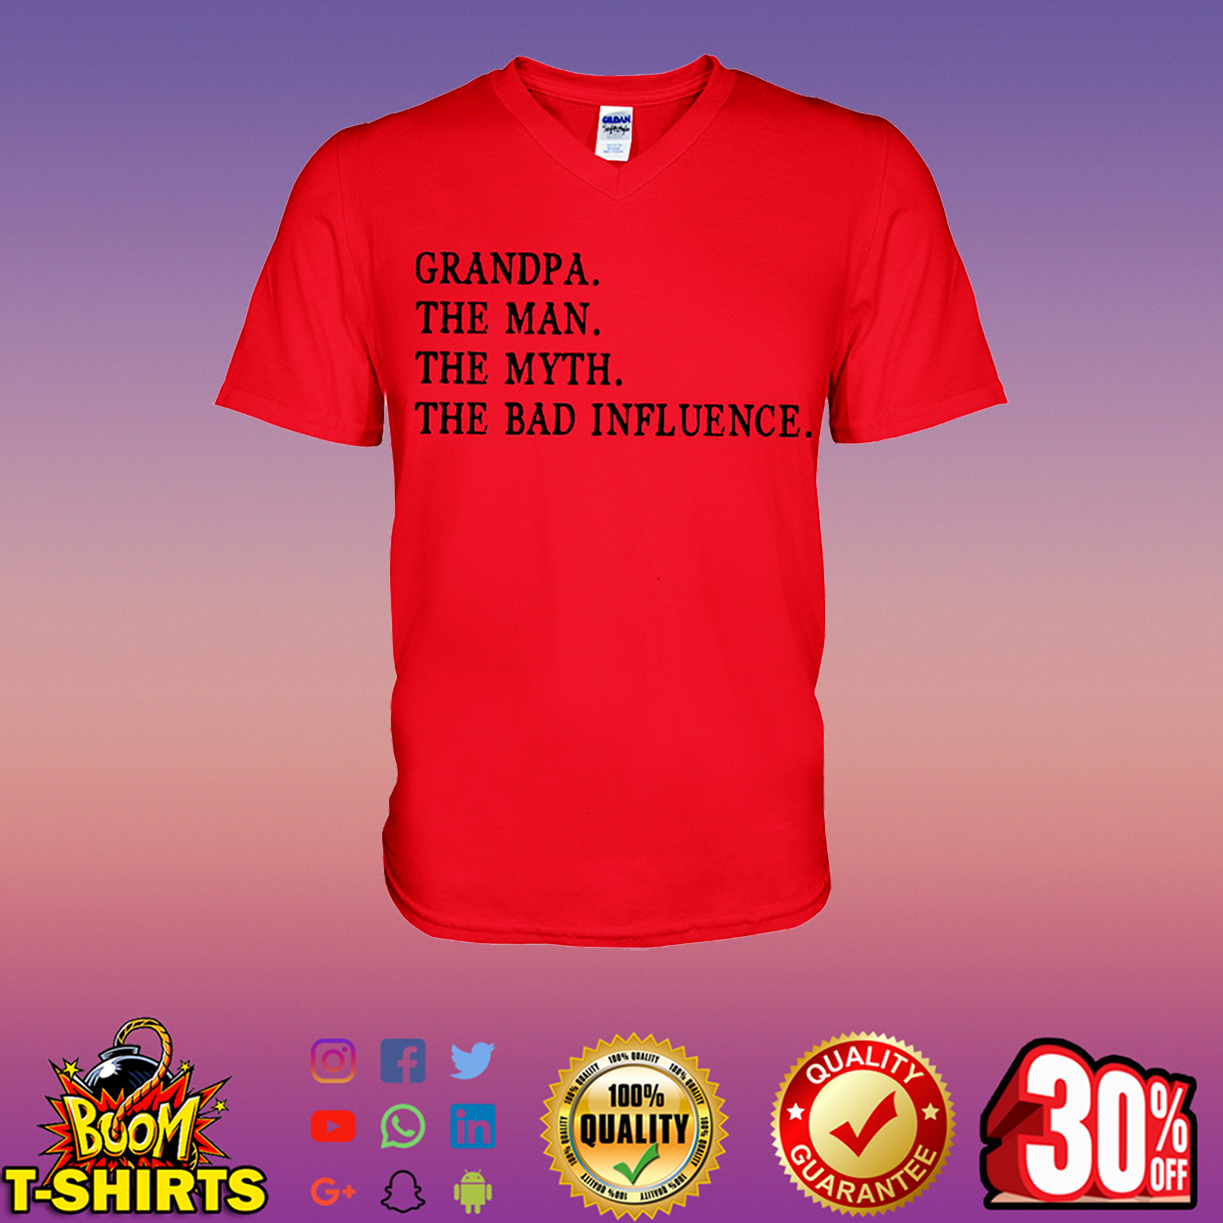 Grandpa the man the myth the bad influence v-neck t-shirt